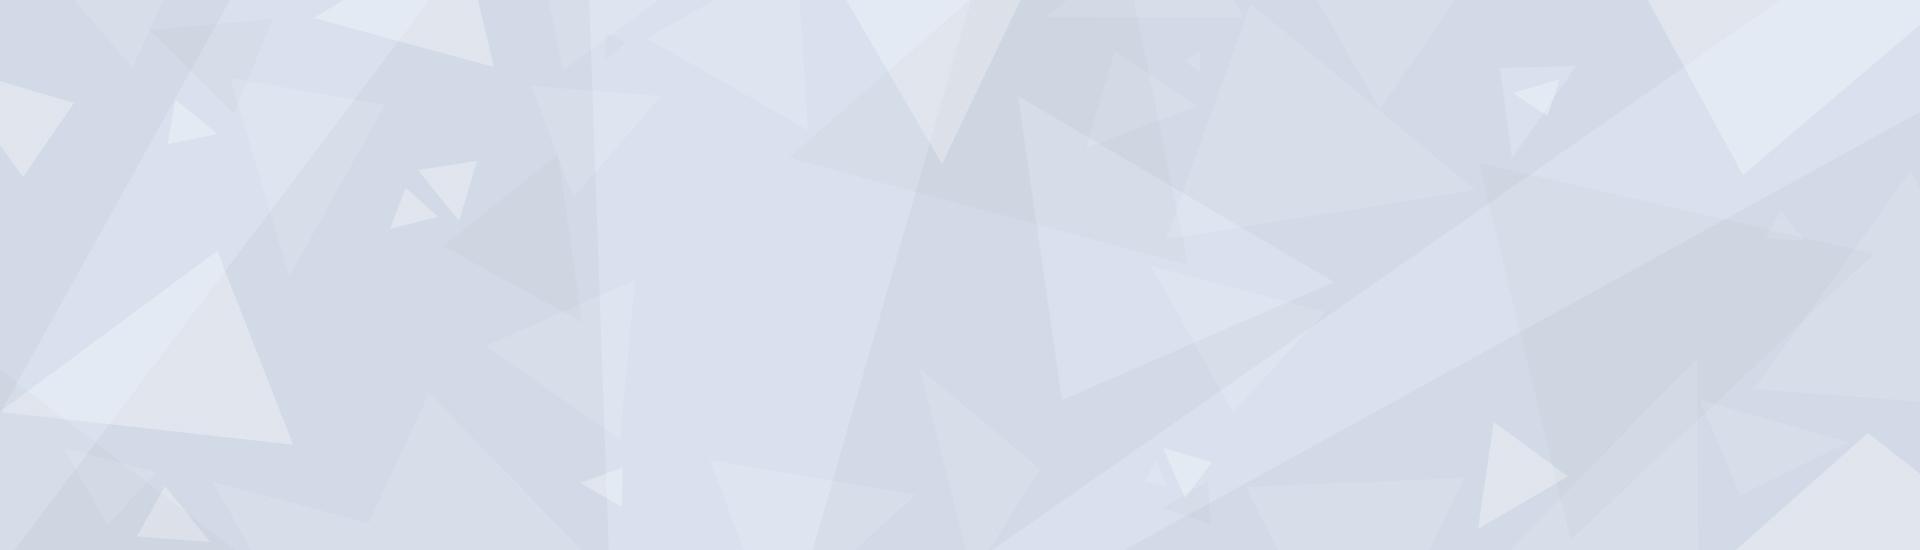 platix - VSLeague Online eSport